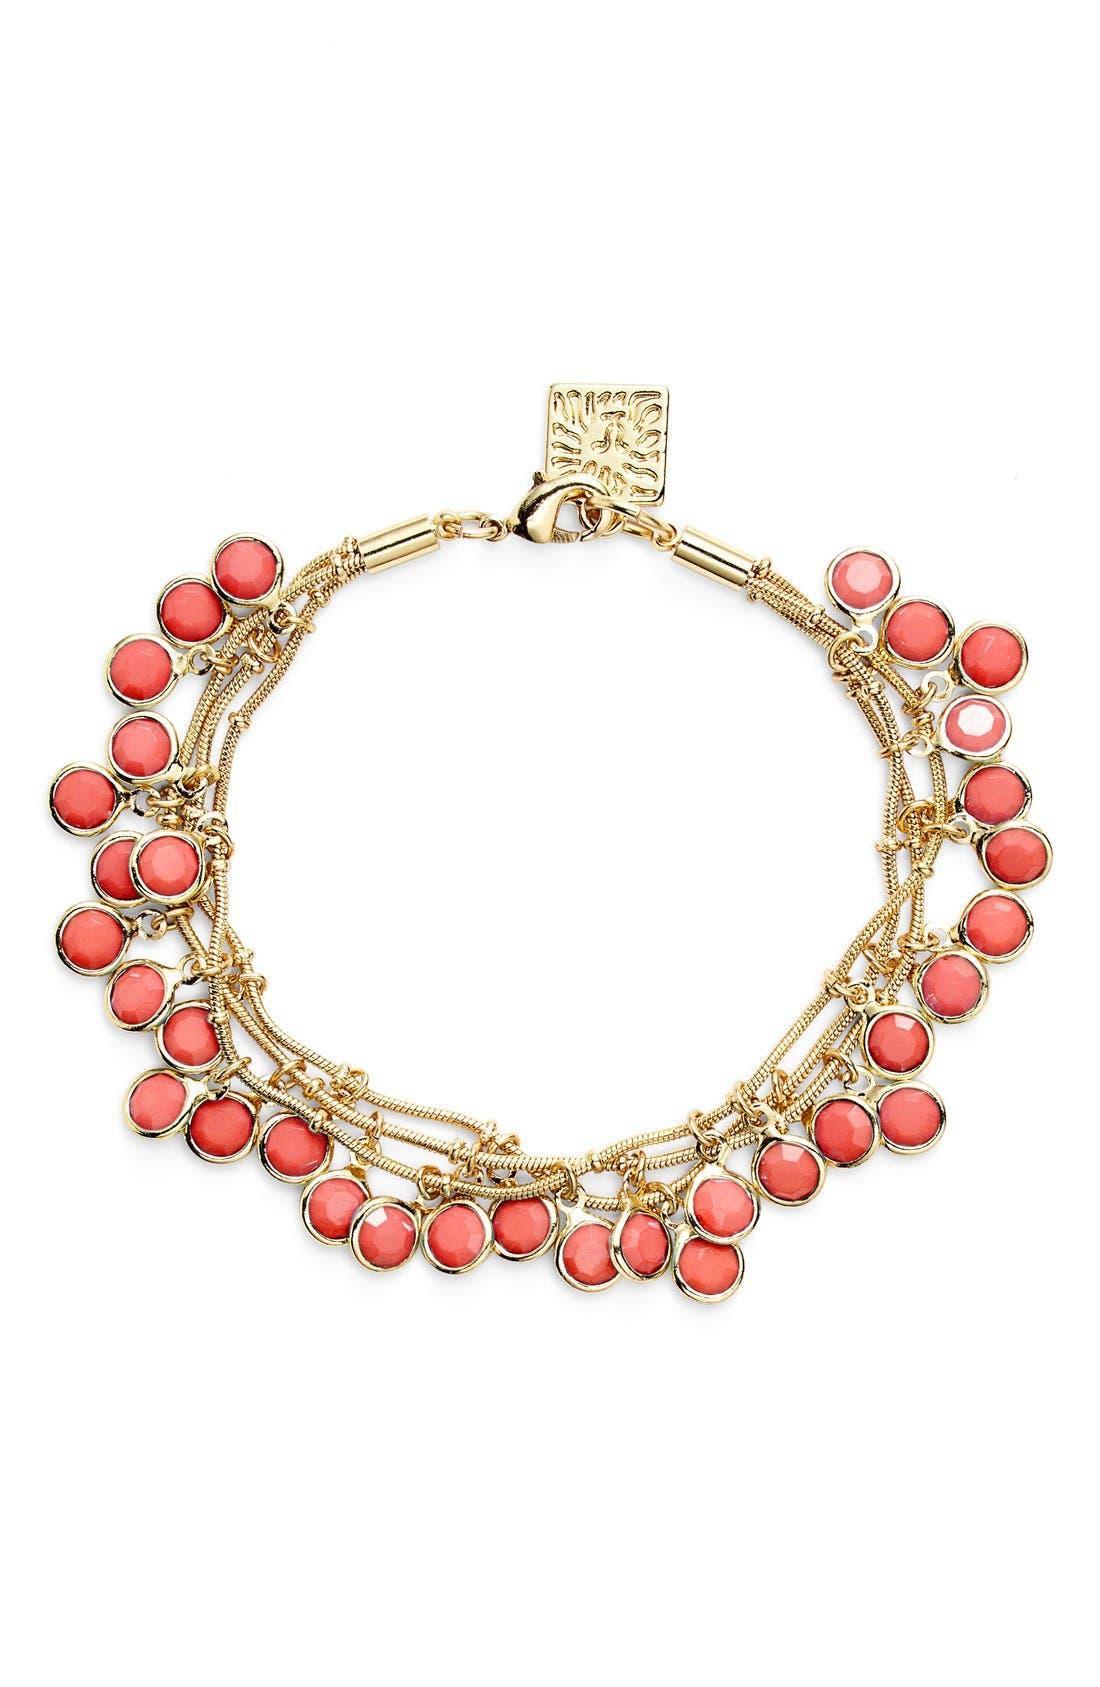 Main Image - Anne Klein 'Beacon Ct.' Multistrand Charm Bracelet